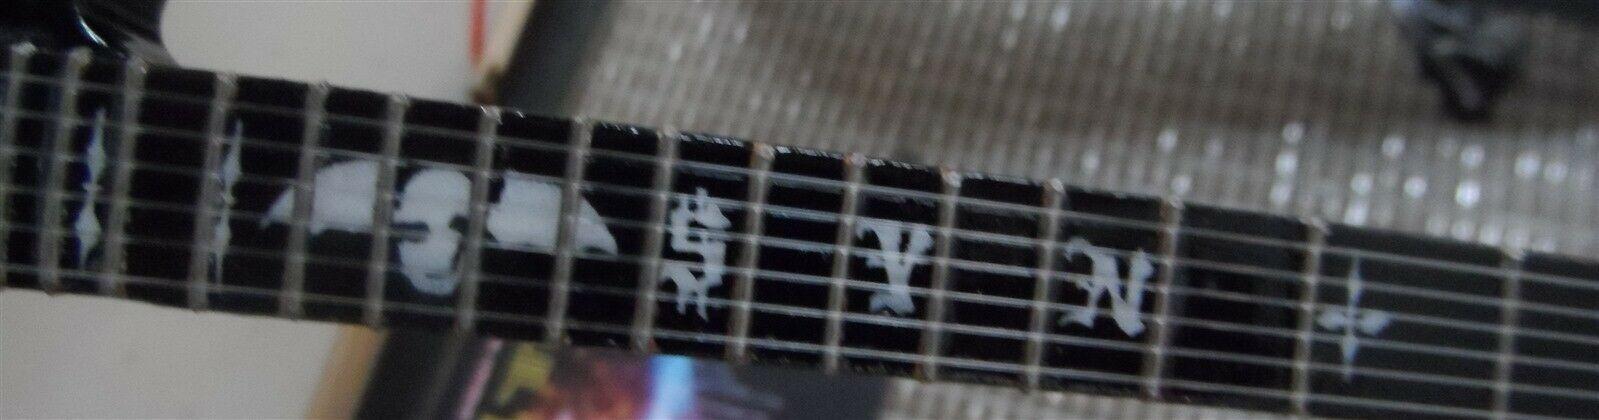 Synyster Tore - Schecter Syn Schwarz Signature 1:4 Nachbildung Gitarre ~ Neu